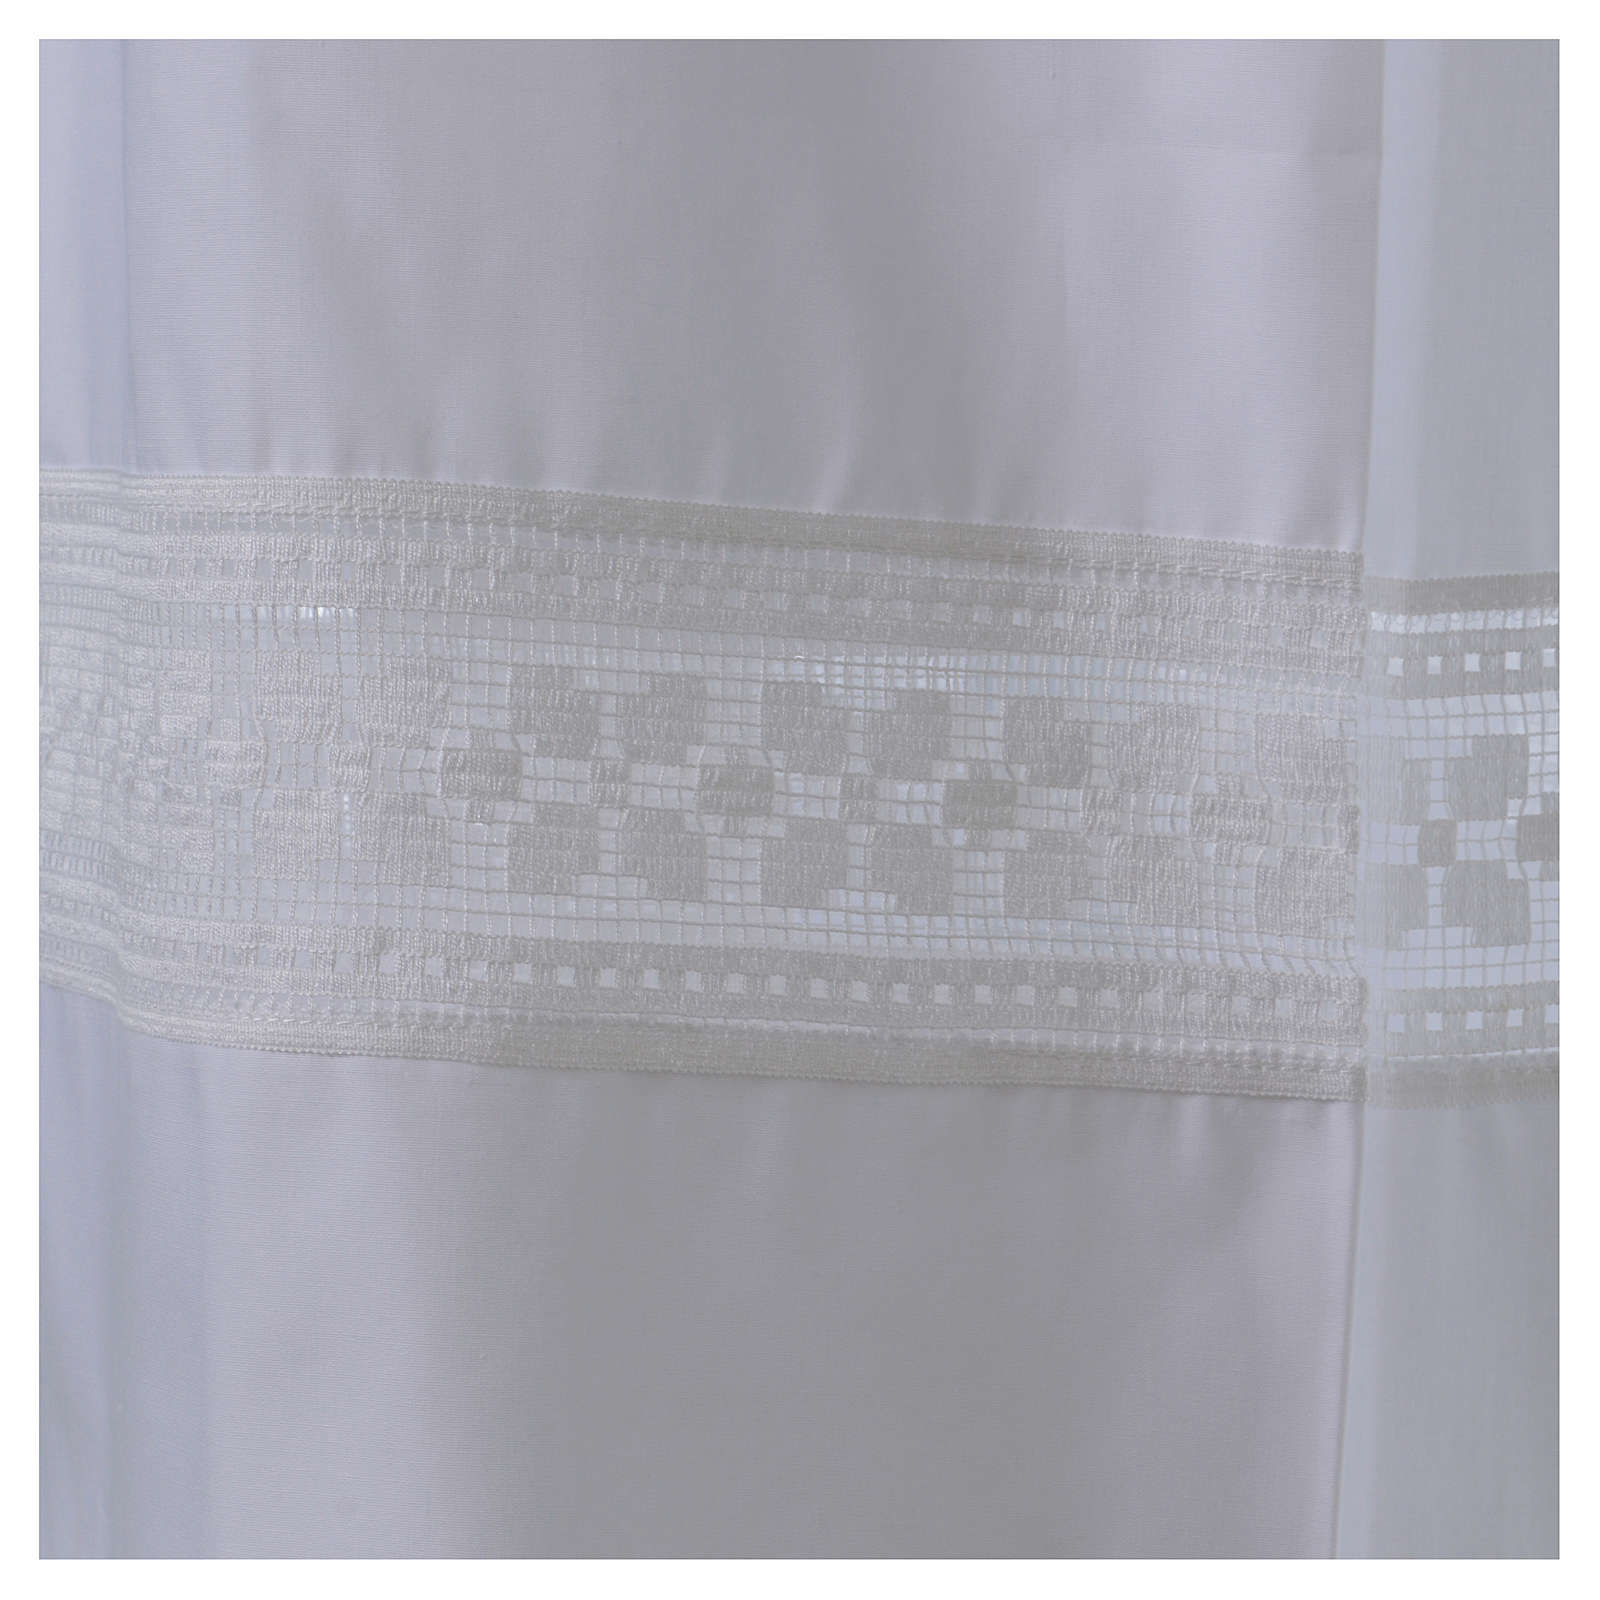 Alba algodón mixto encaje fondo y mangas 4